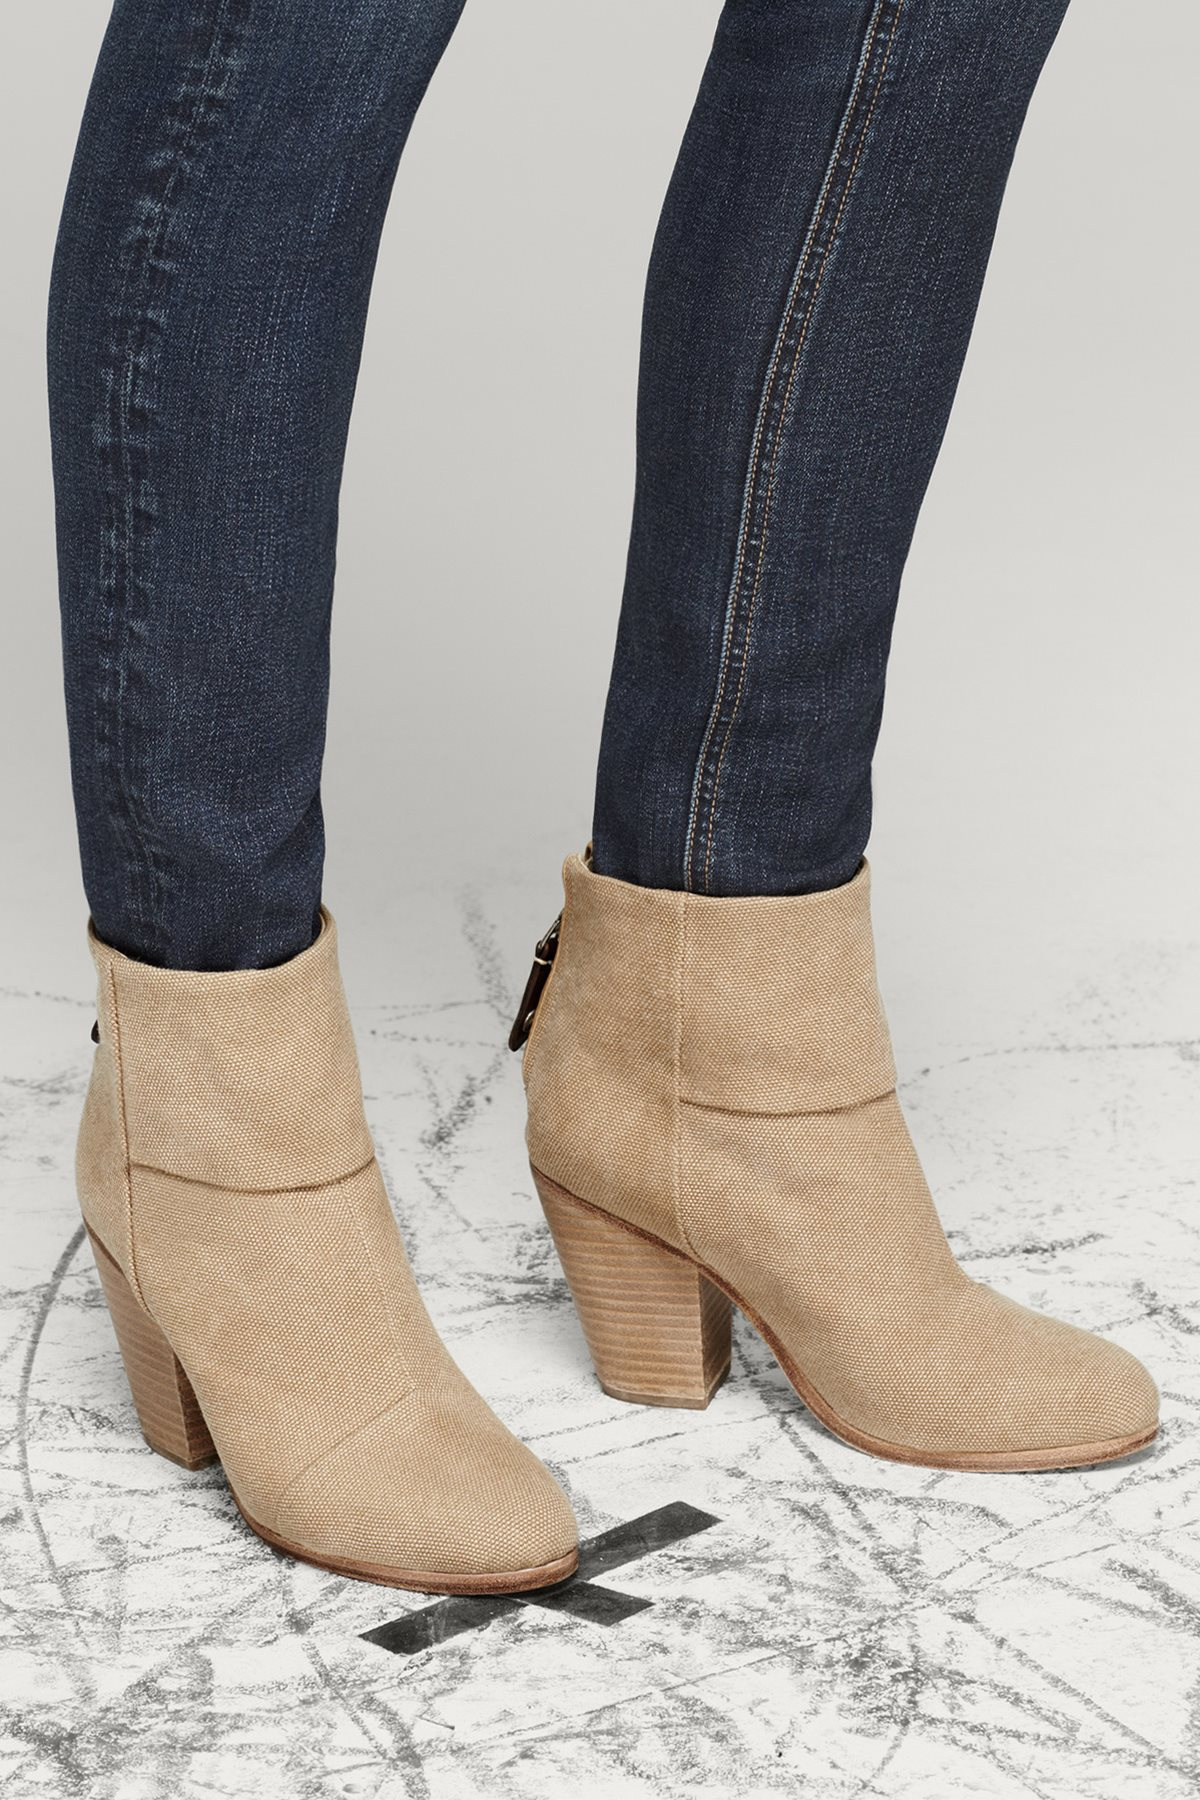 e264f7f3b Gallery. Women's Rag & Bone Newbury Ankle Boots